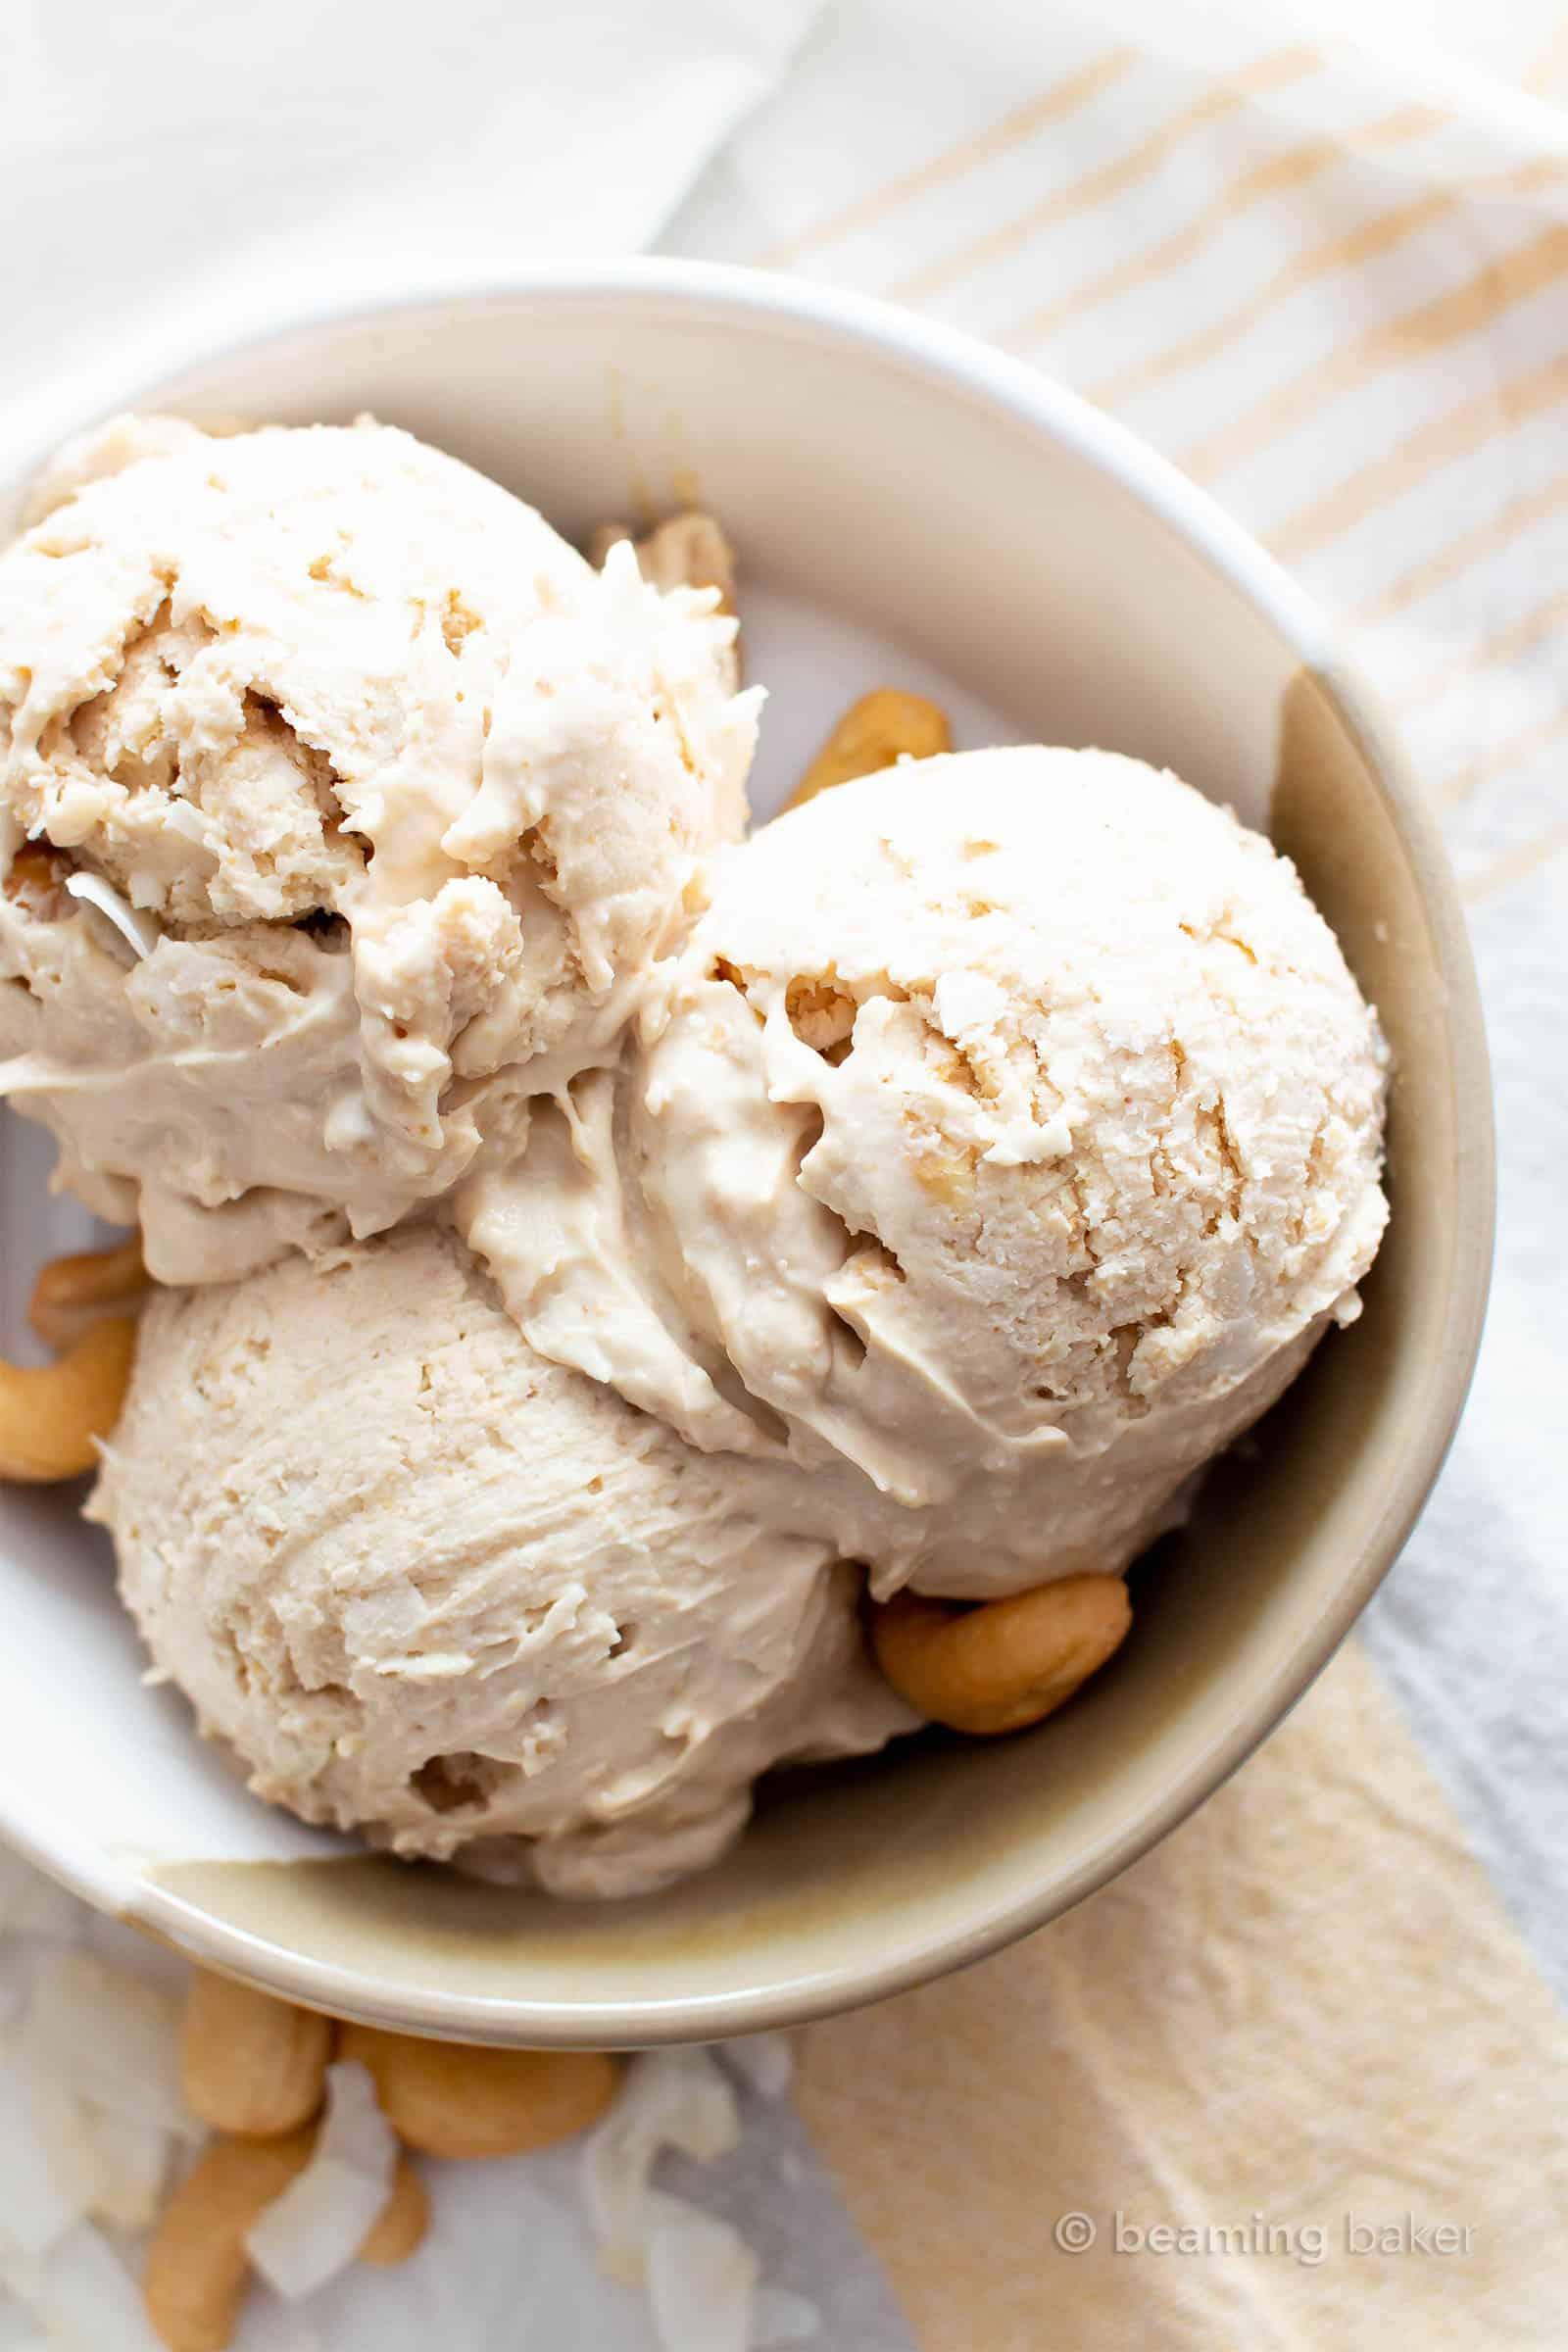 Cashew Ice Cream Recipe: just 3 ingredients for deliciously creamy cashew ice cream. The best cashew ice cream recipe—no churn, super easy and satisfying! Vegan, Paleo. #Cashew #IceCream #CashewIceCream #CashewButter | Recipe at BeamingBaker.com